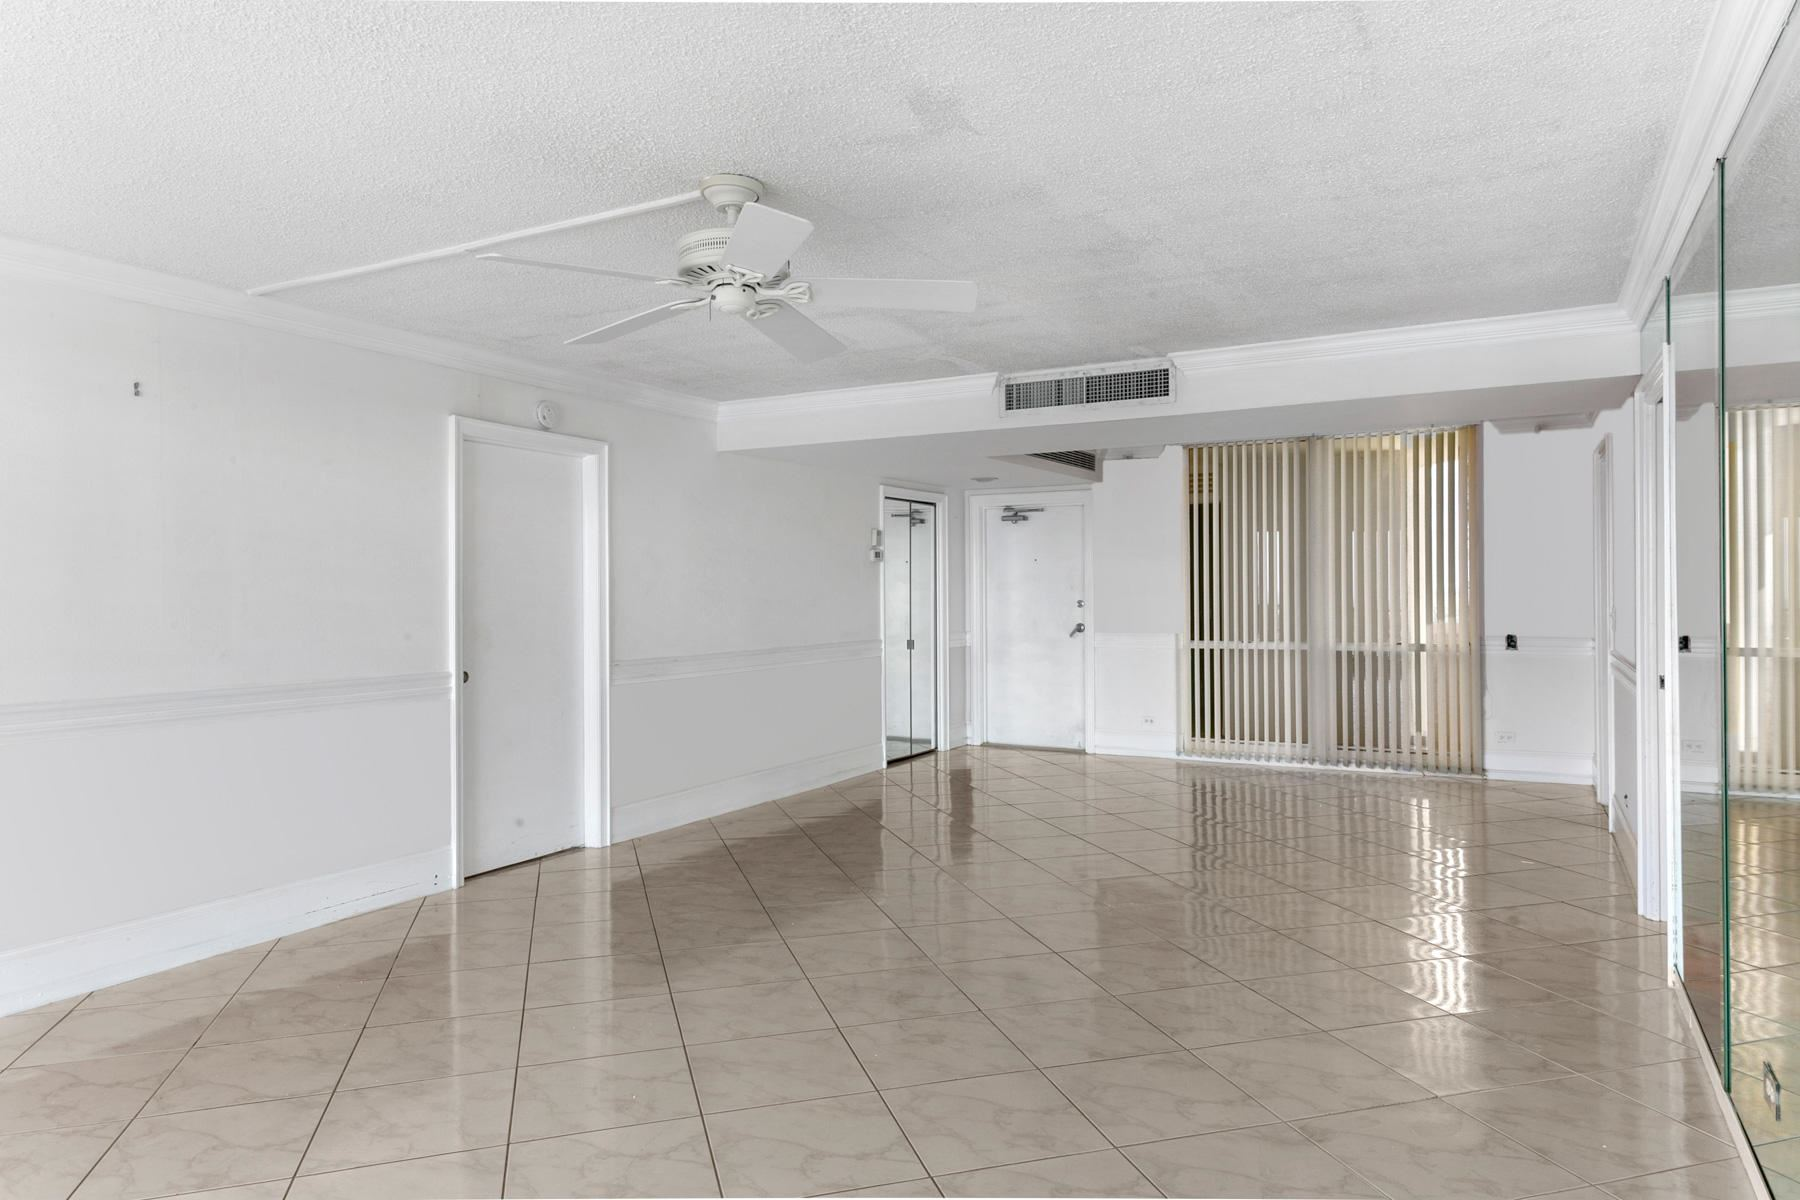 Photo of 130 Lakeshore Drive #T22, North Palm Beach, FL 33408 (MLS # RX-10693279)